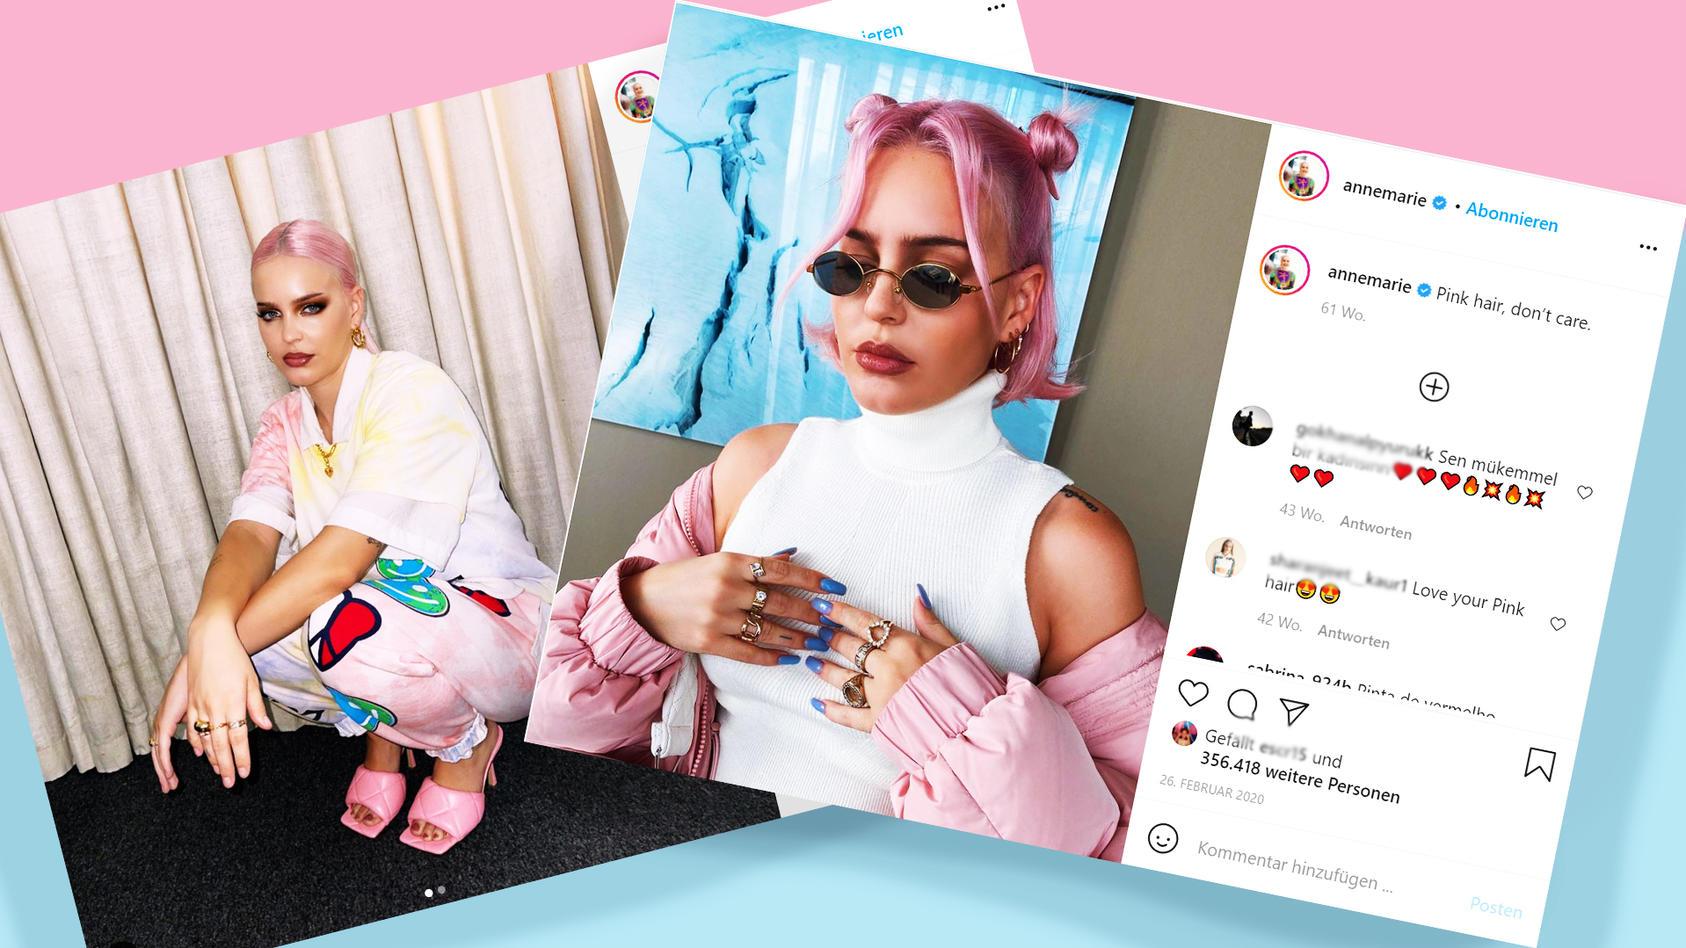 Anne-Marie ist großer Fan der Trend-Farbe Pastell-Pink.